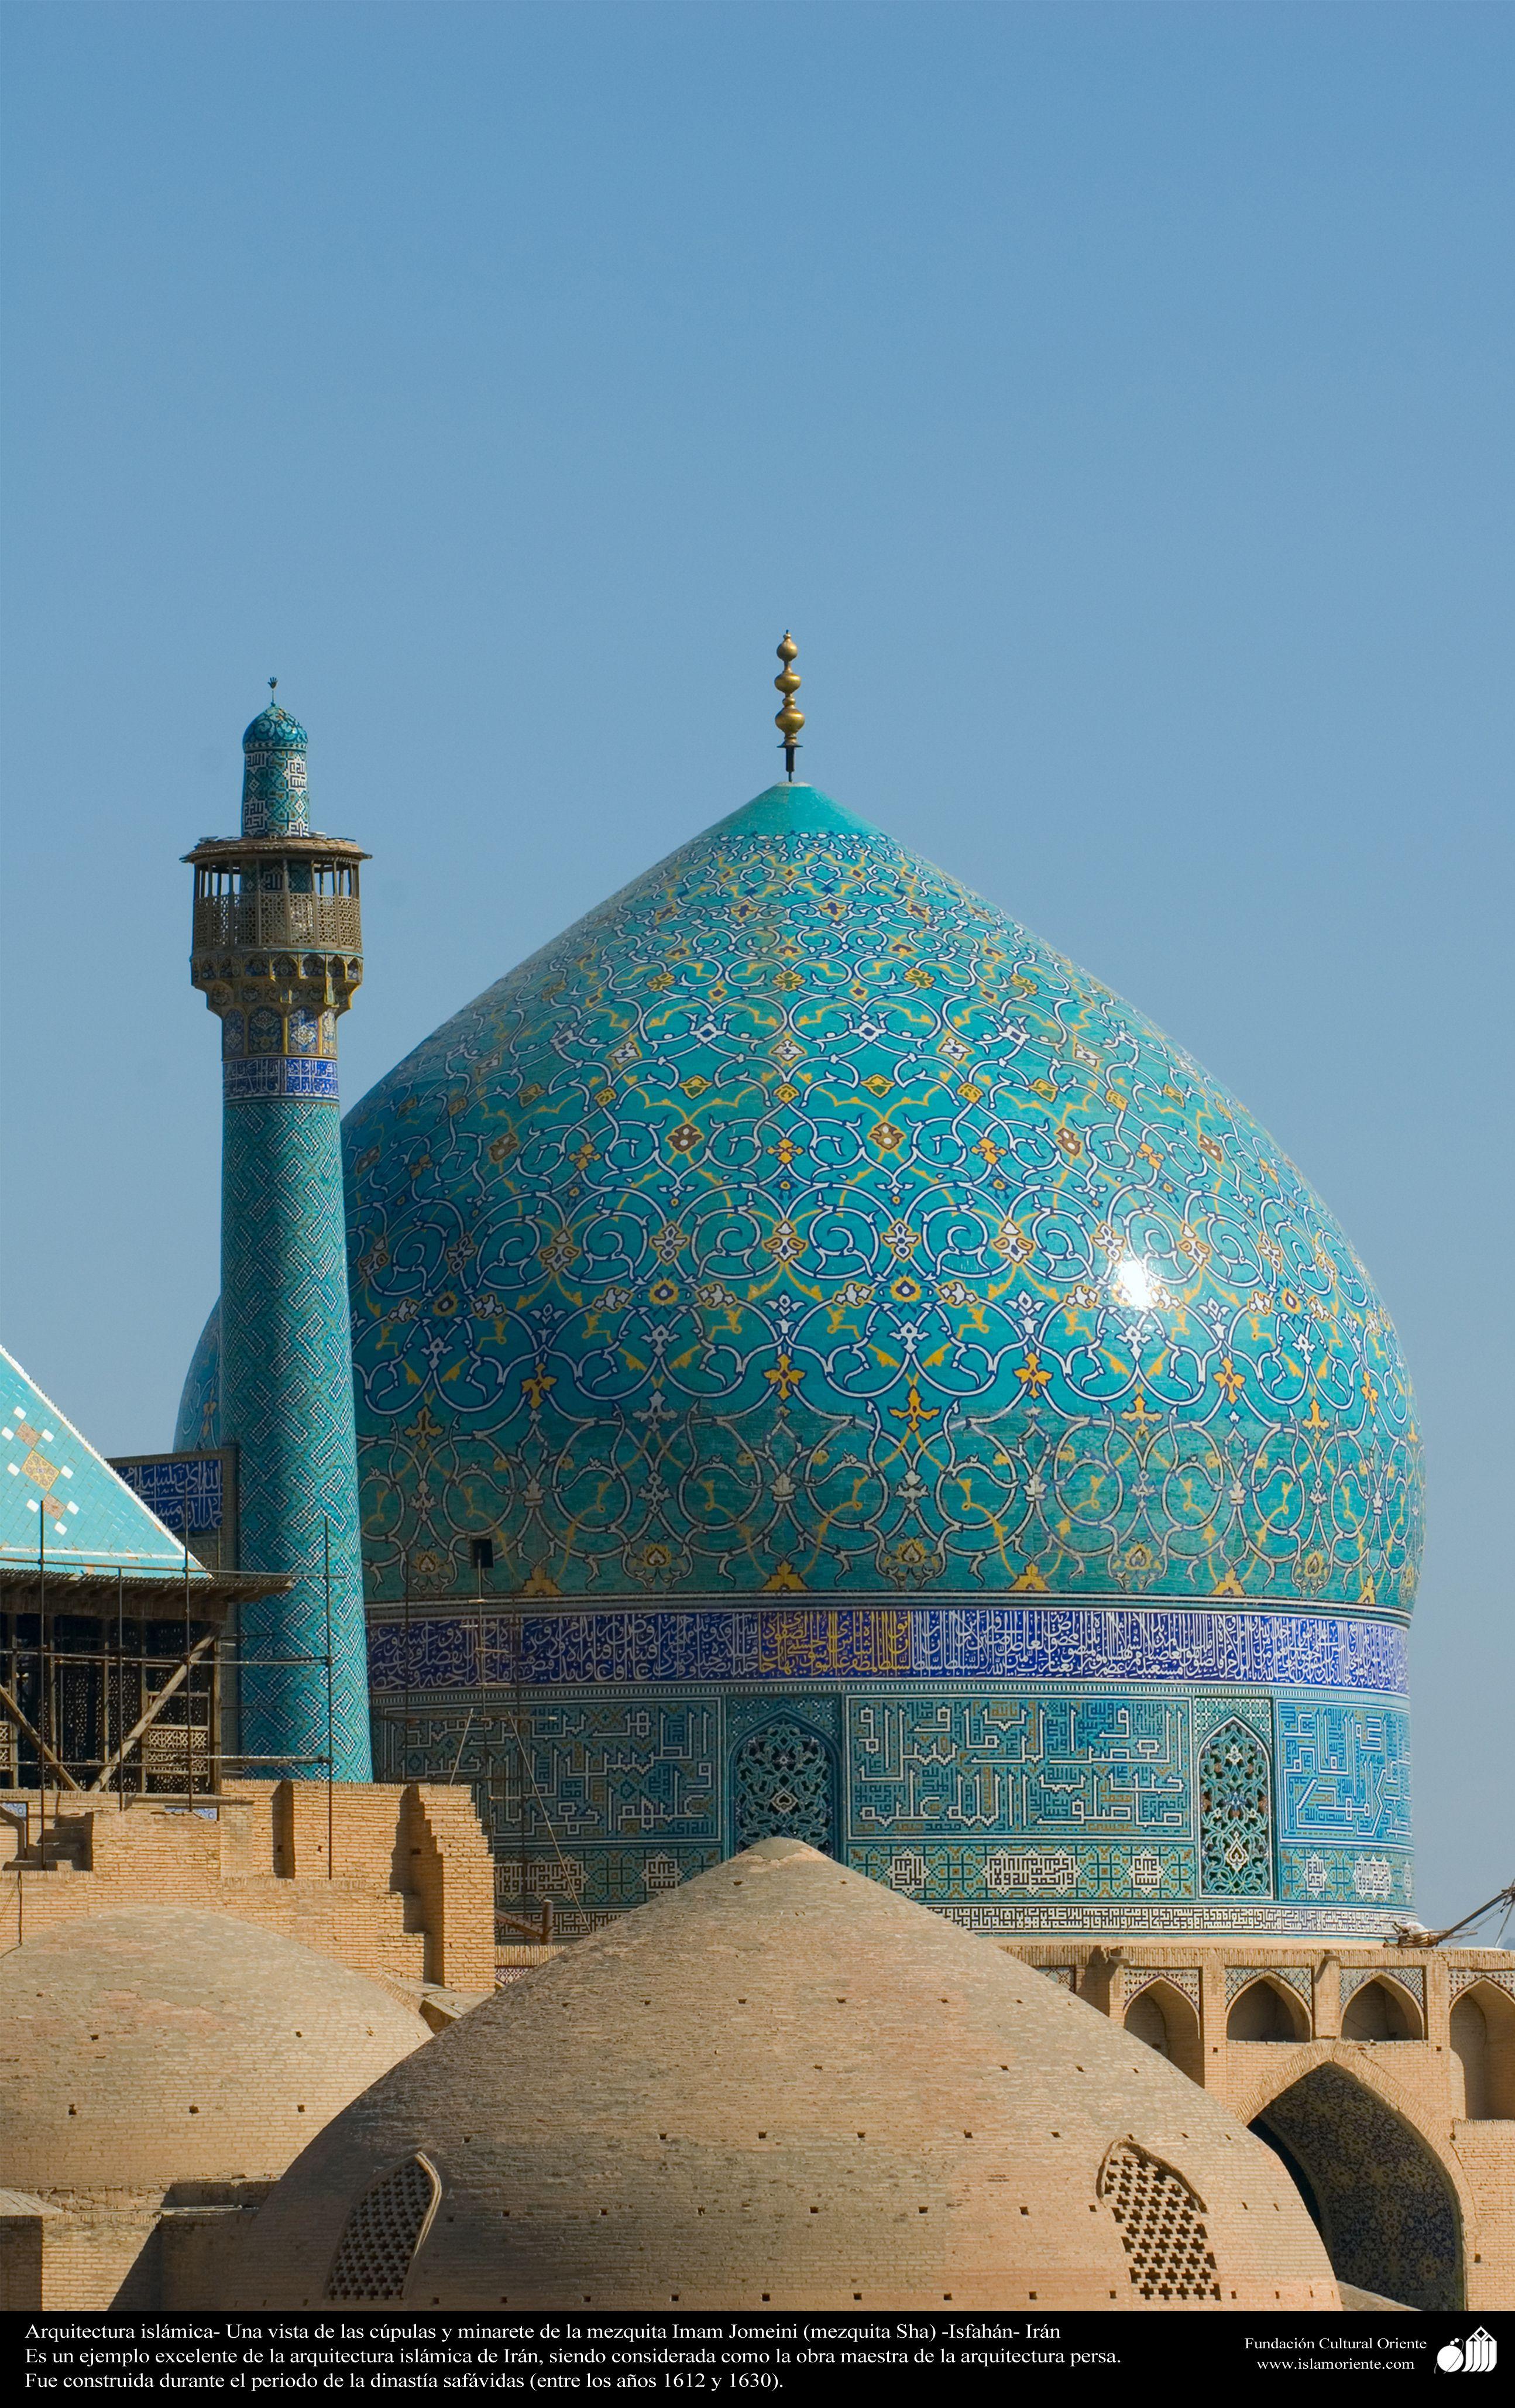 Arquitectura isl mica una vista de las c pulas y minarete for Arquitectura islamica